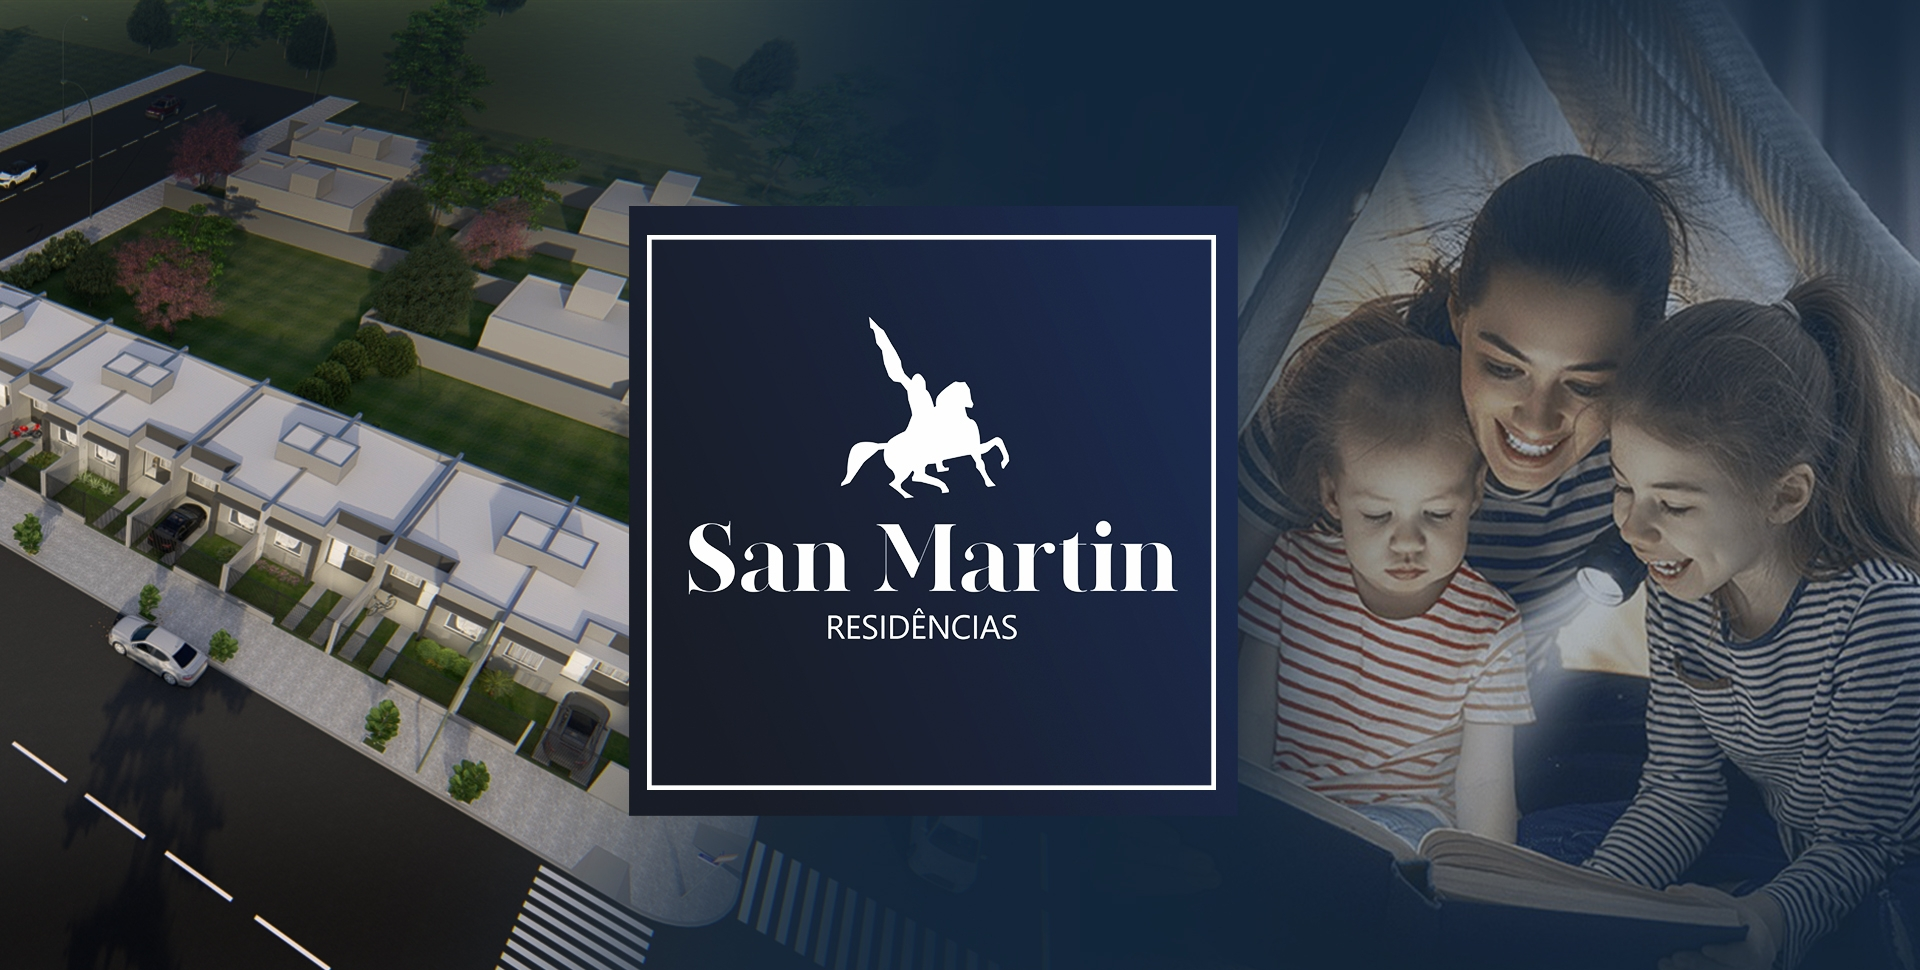 SAN MARTIN | Residências